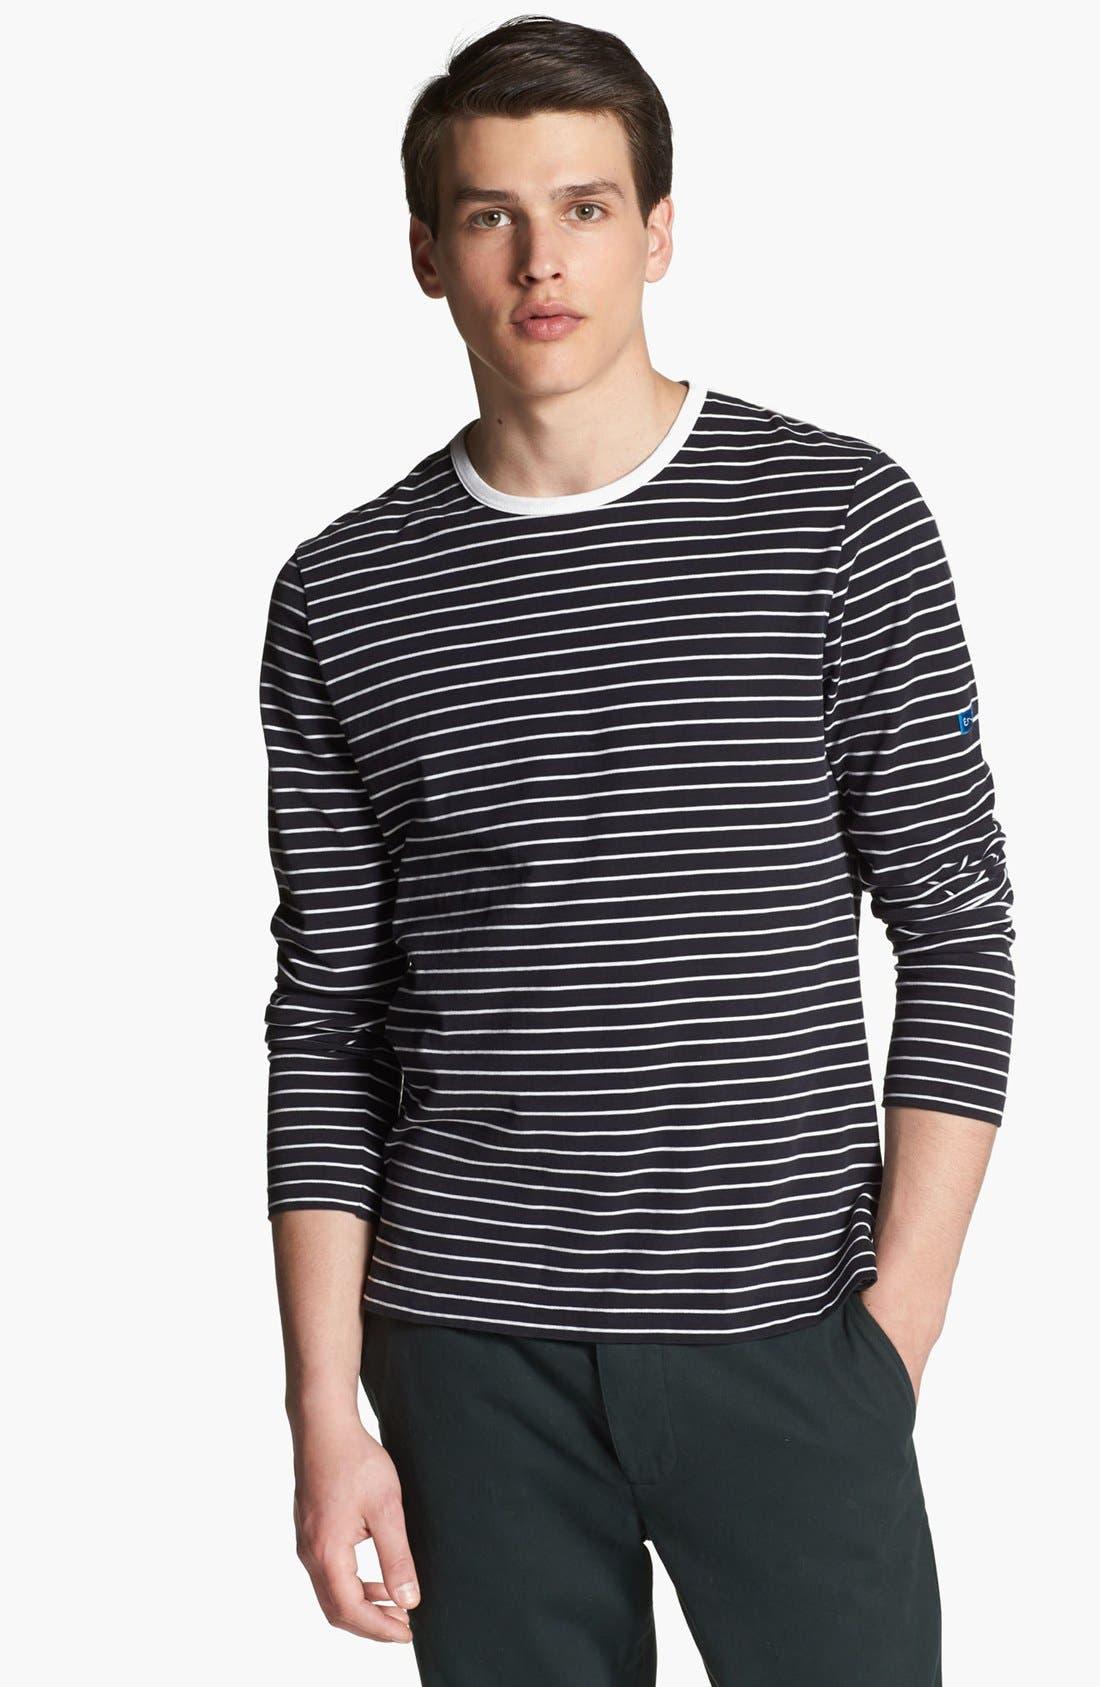 SHIPLEY & HALMOS 'Spaniel' Stripe Long Sleeve T-Shirt, Main, color, 414